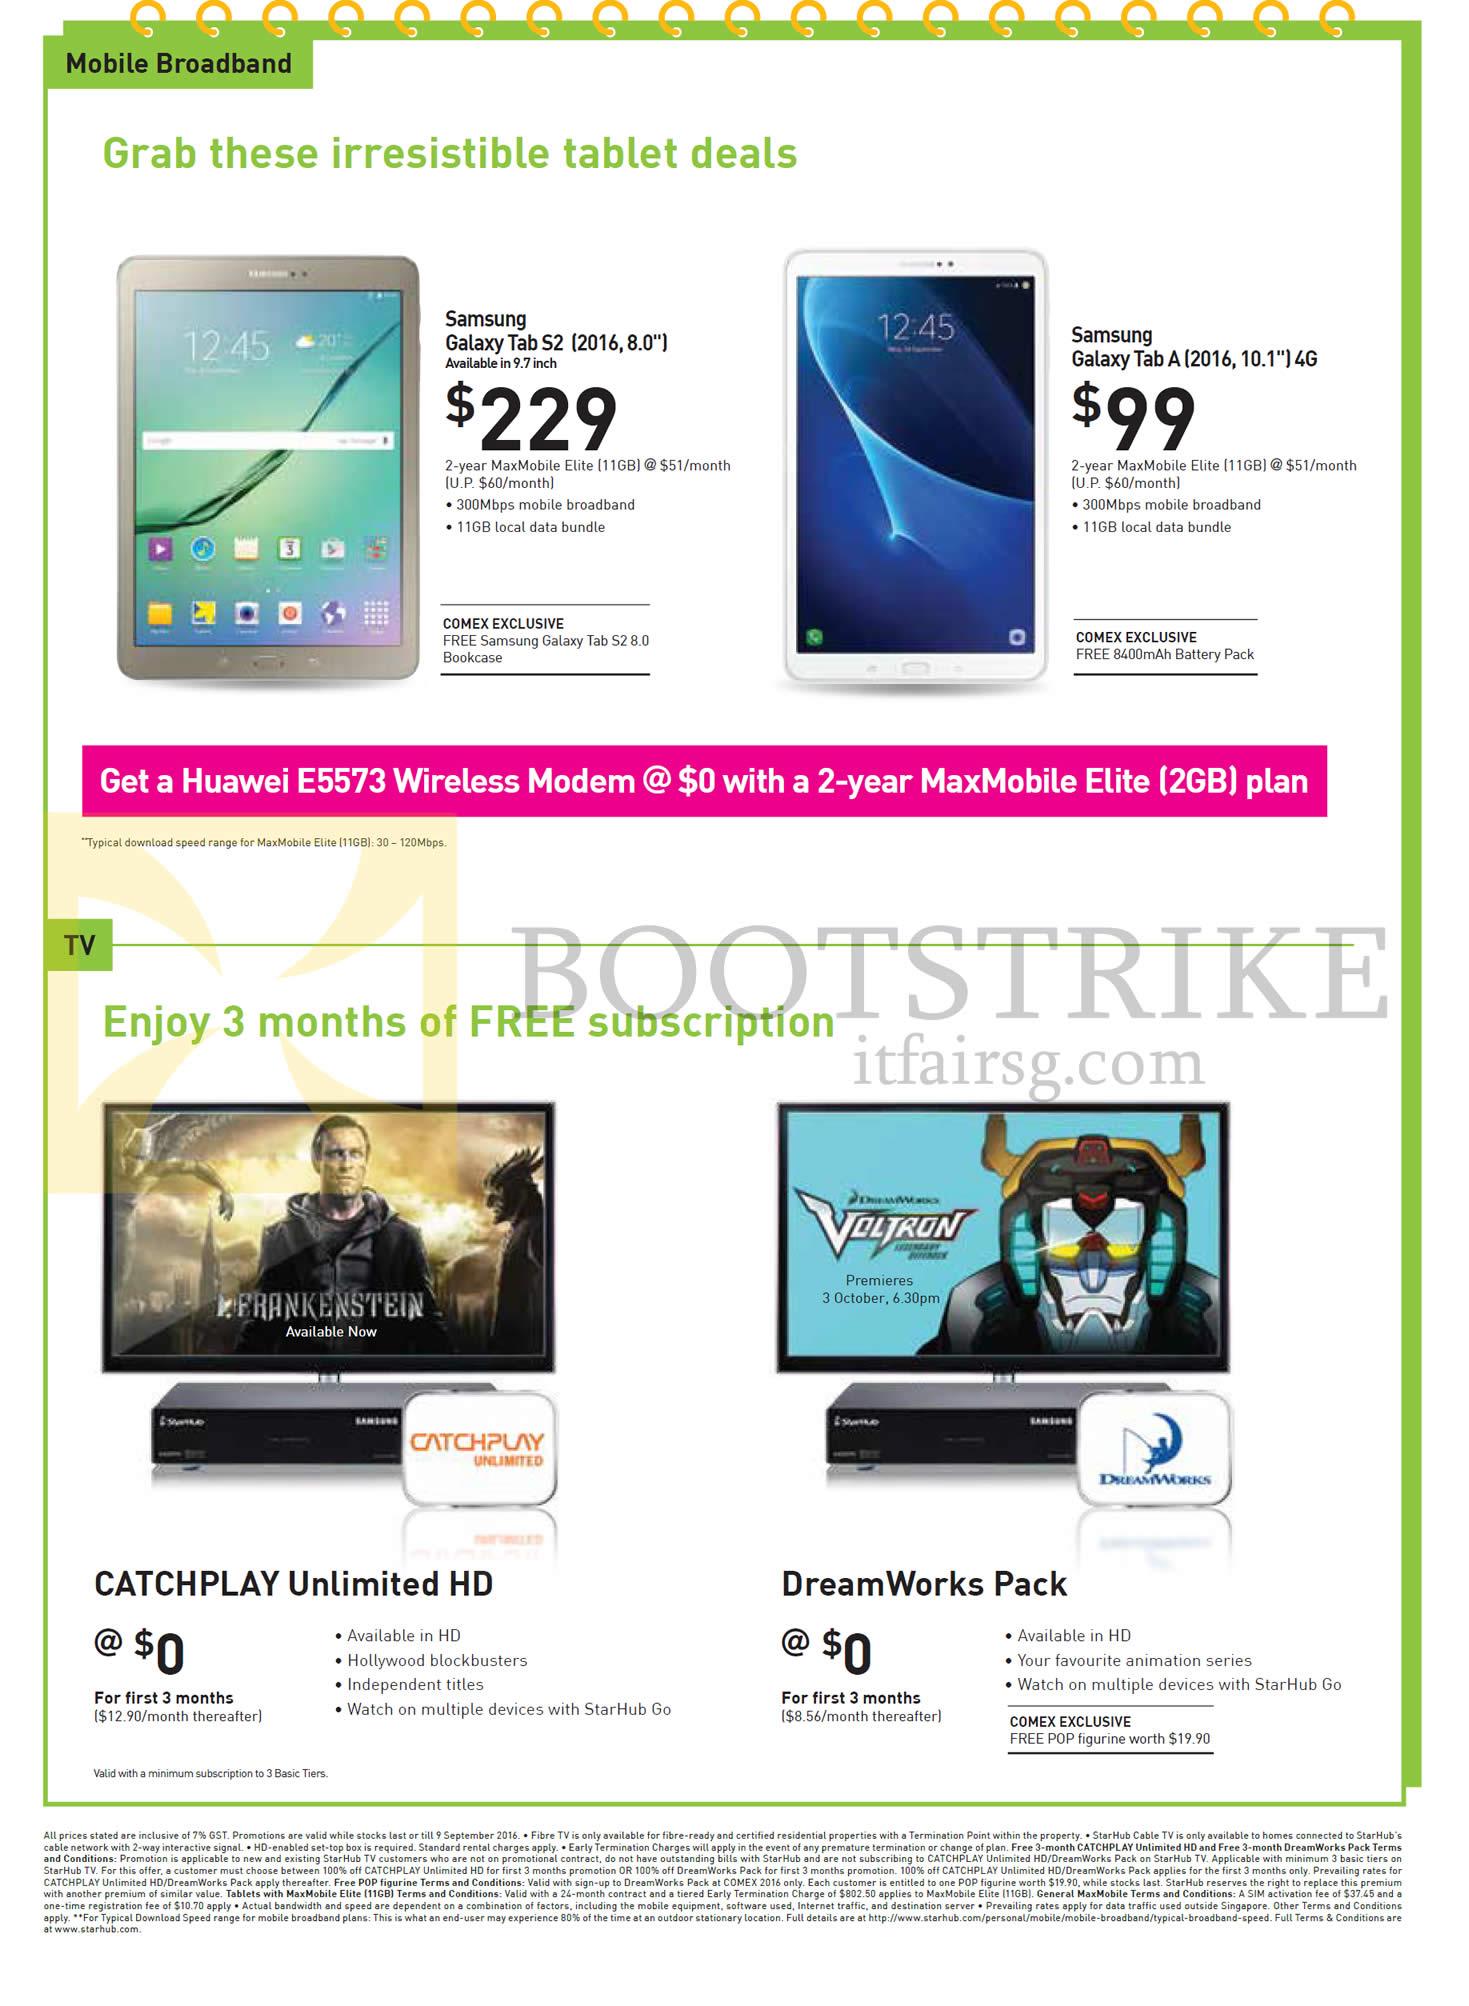 COMEX 2016 price list image brochure of StarHub Mobile Broadband, TVs, Samsung Galaxy Tab S2 2016 8.0, Tab A 2016 10.1, Catchplay Unlimited HD, DreamWorks Pack